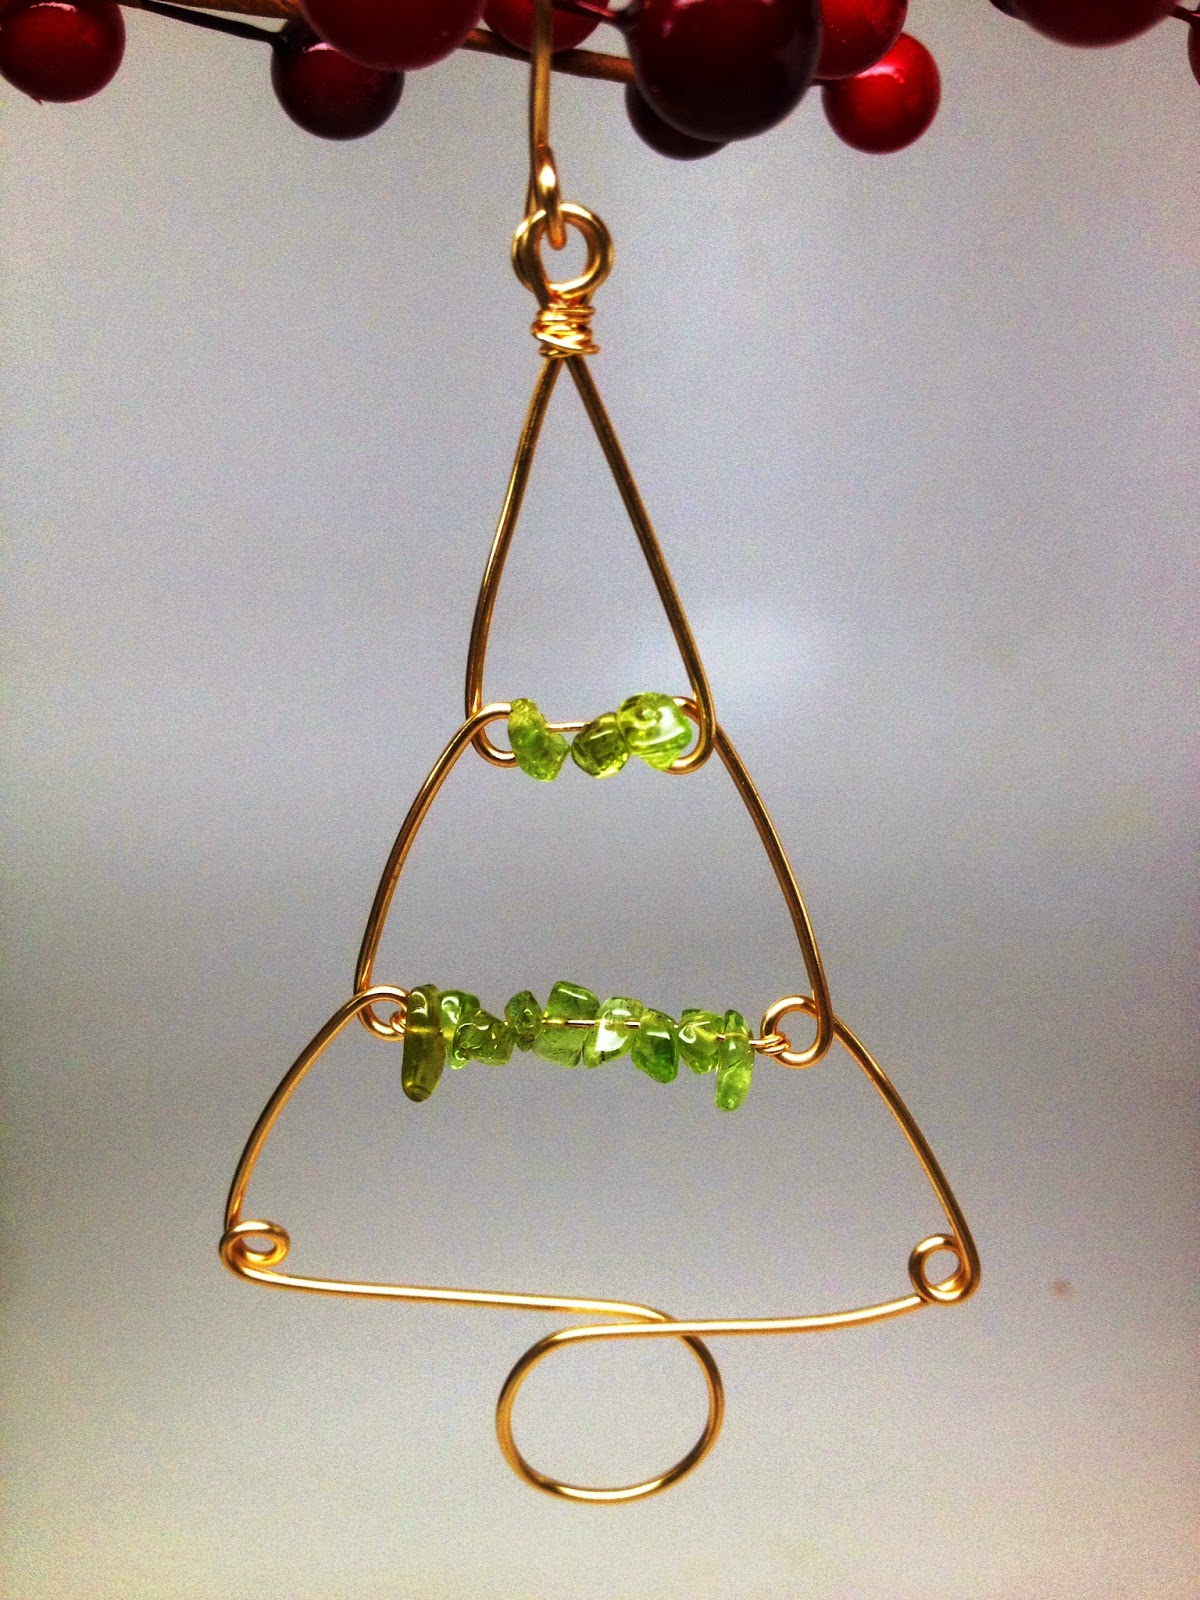 SoftFlexGirl: Four DIY Christmas Tree Wire Ornaments Made ...